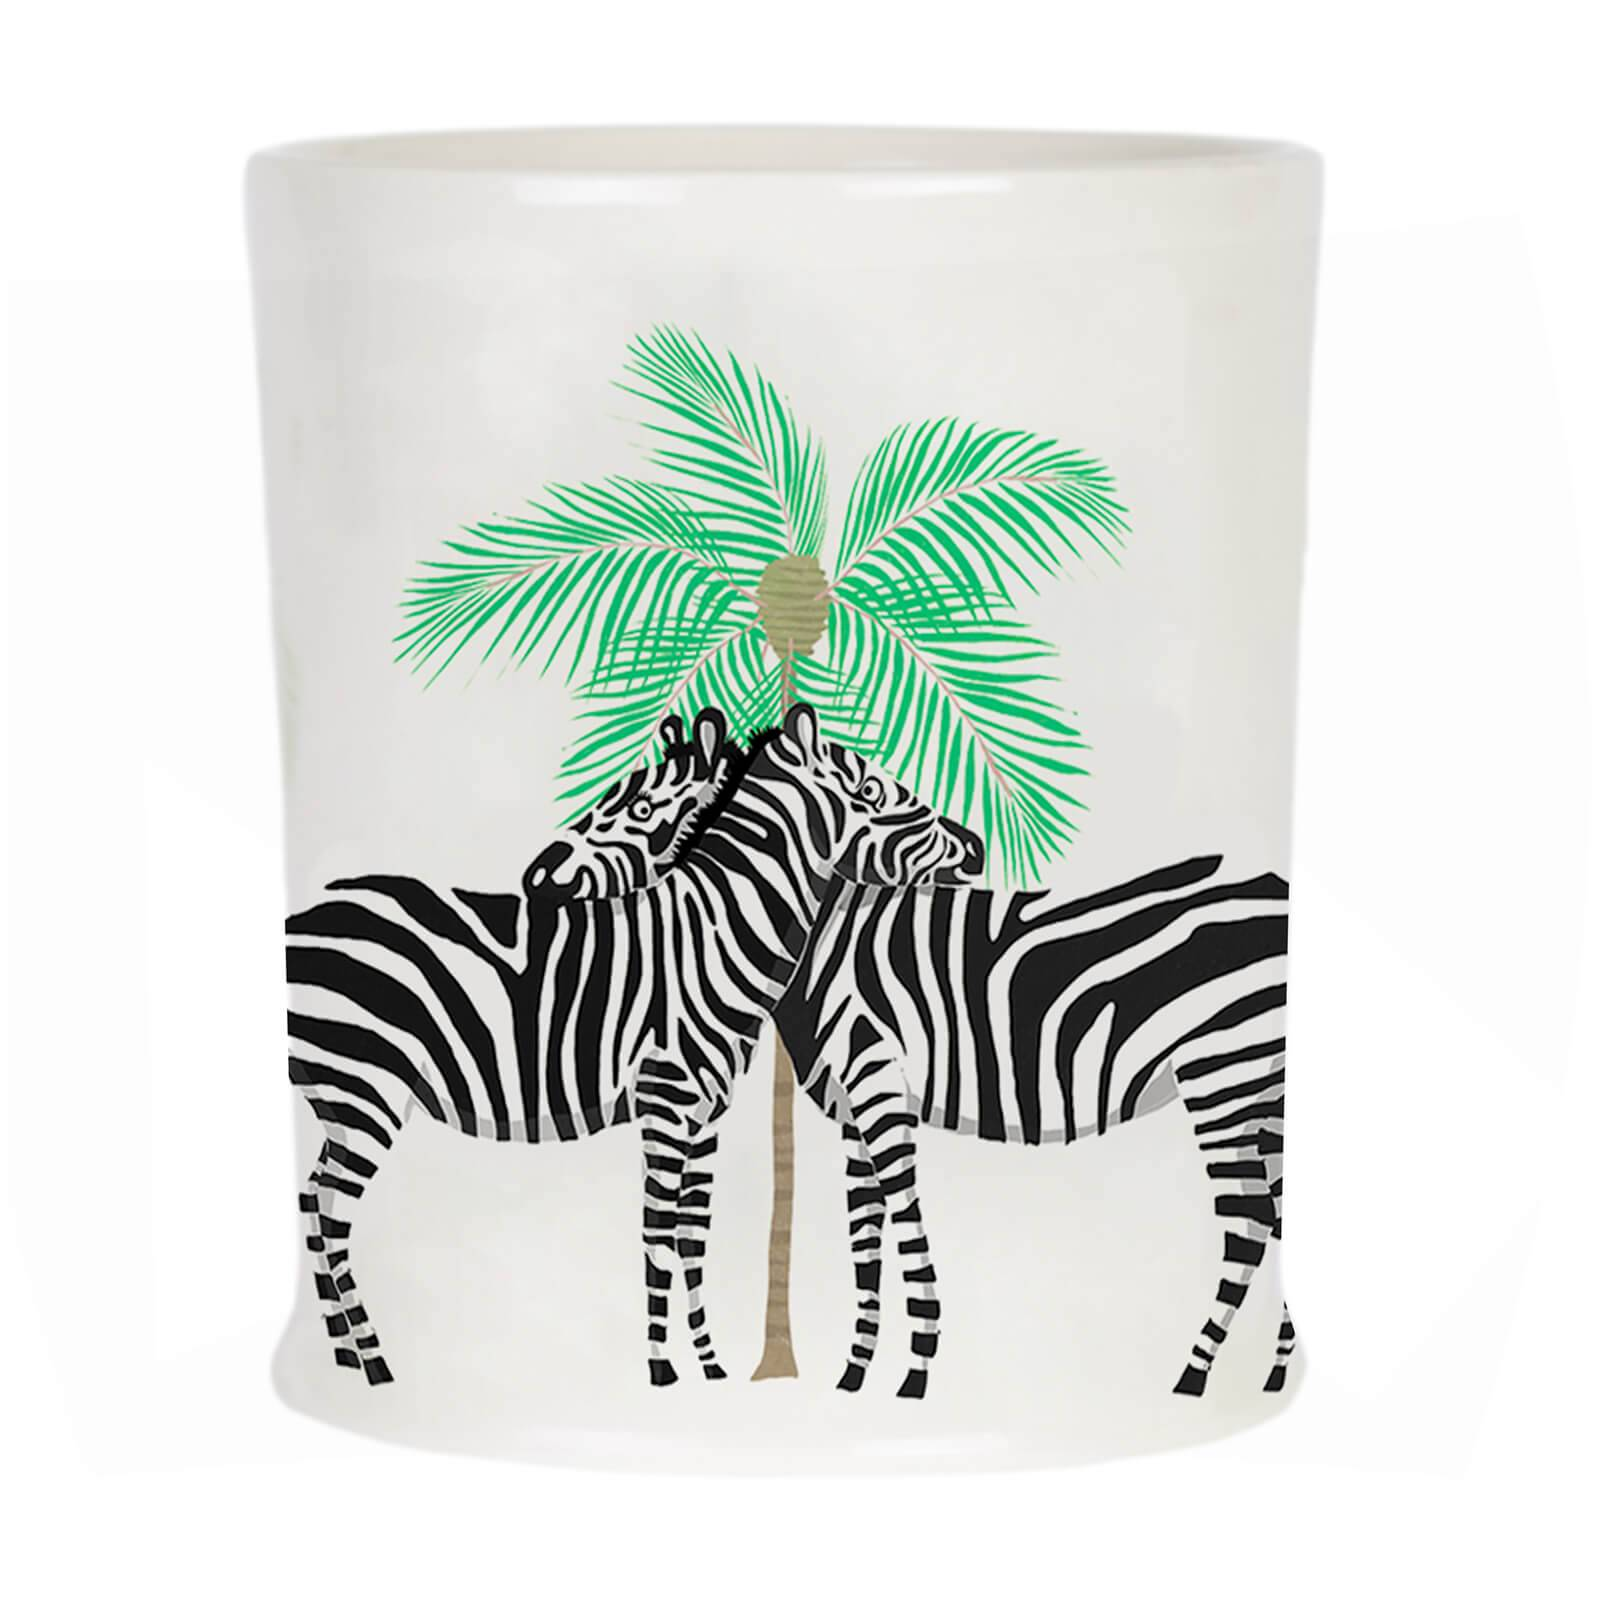 Fenella Smith Zebra Mug